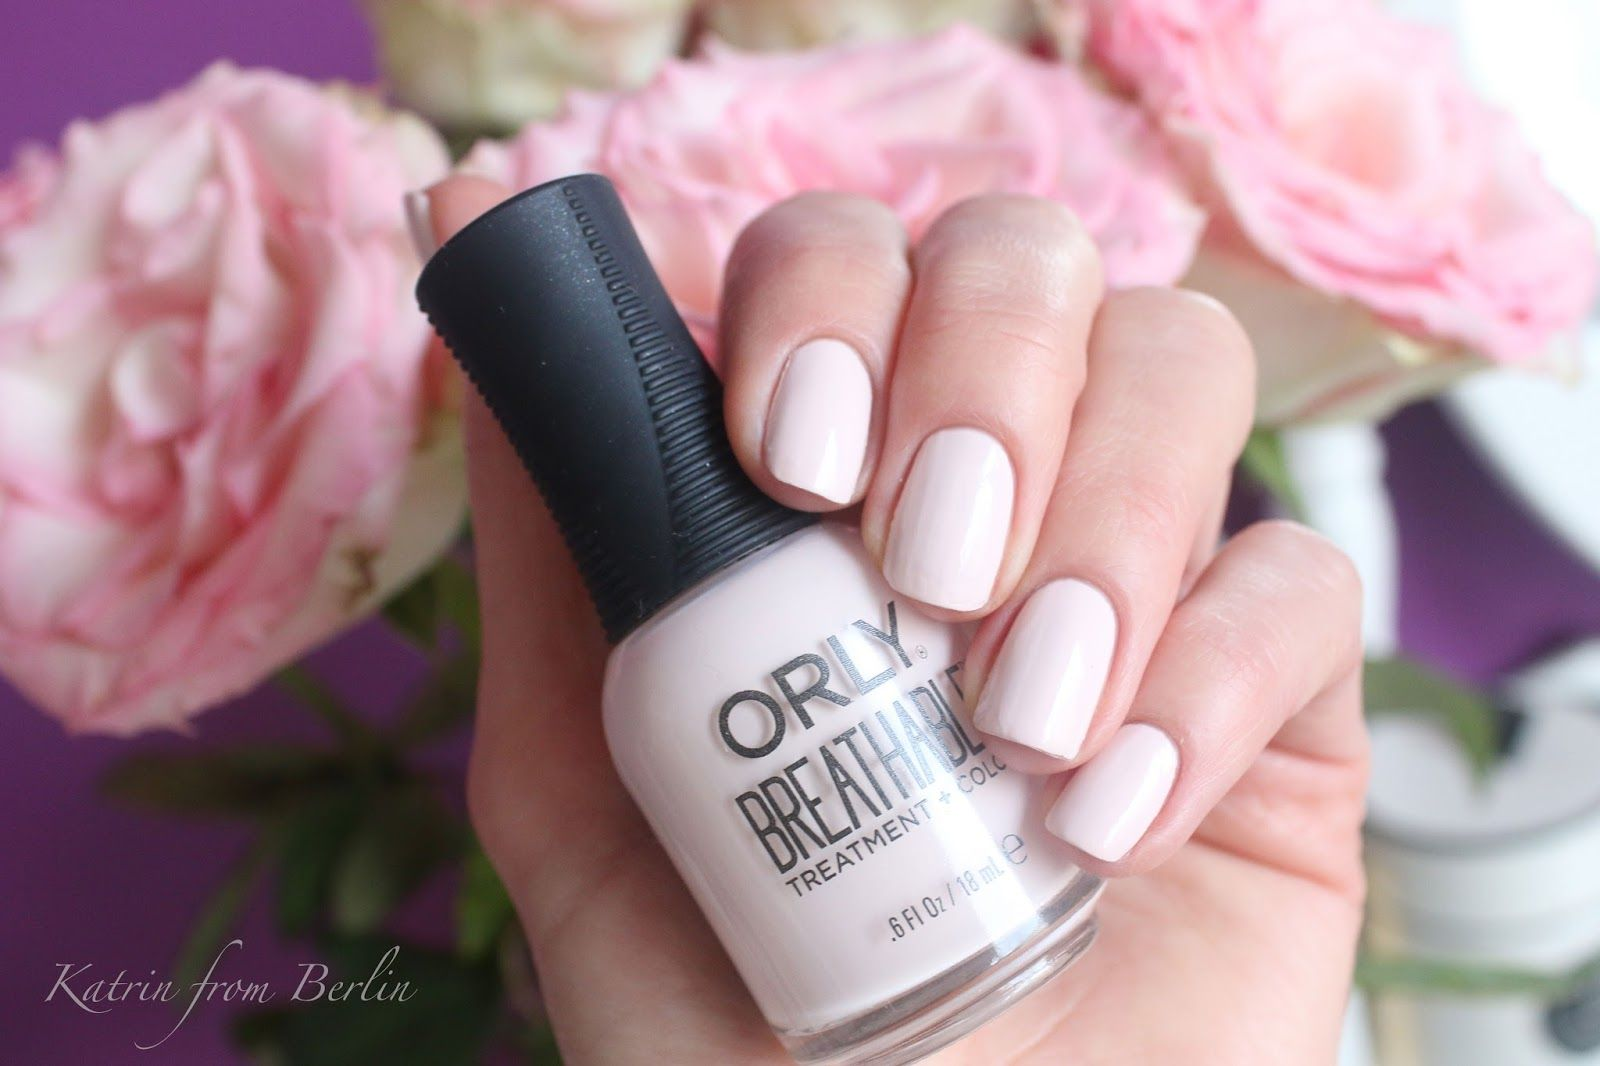 orly breathable rehab swatch - Katrin from Berlin | Nail polish ...